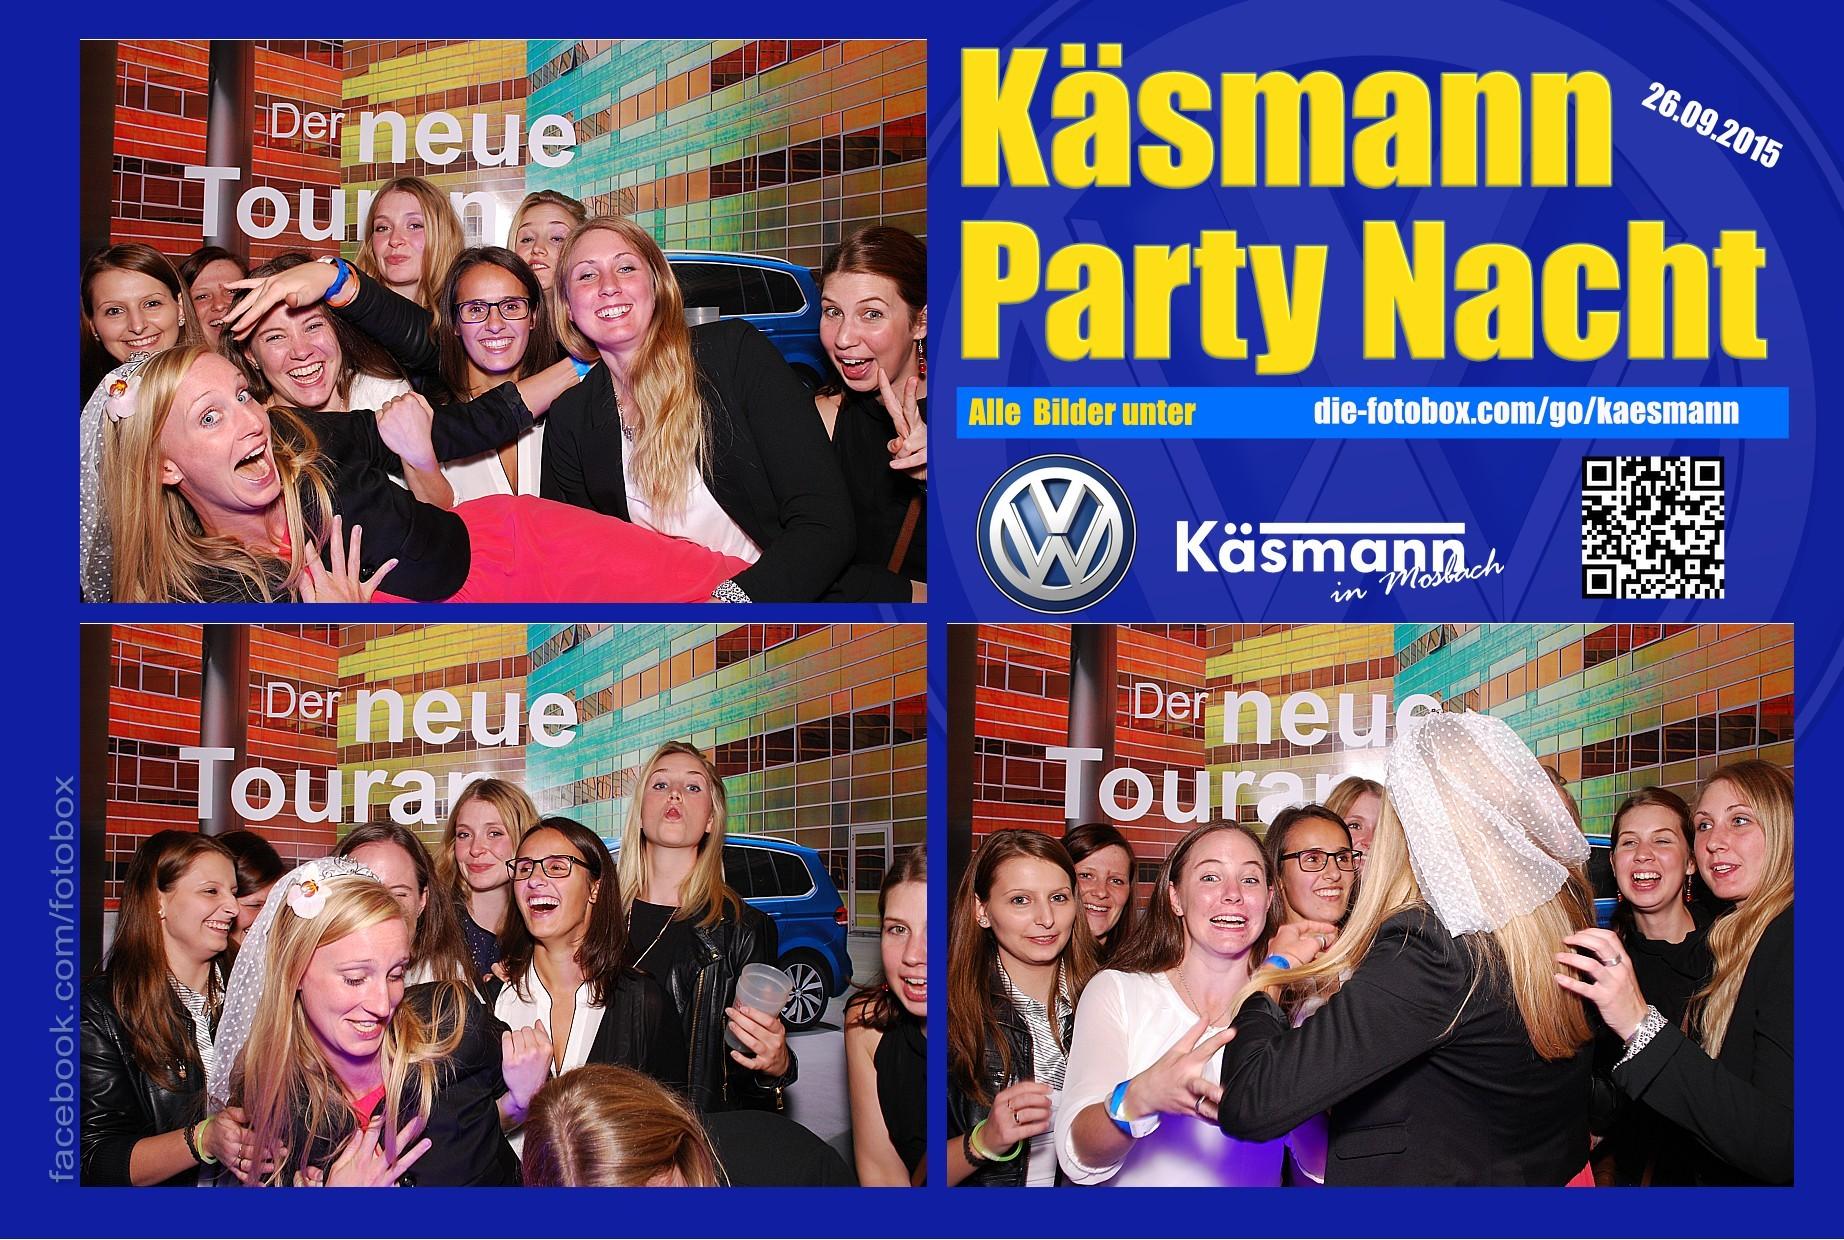 Käsmannparty 2015 - www.die-fotobox.com 01004